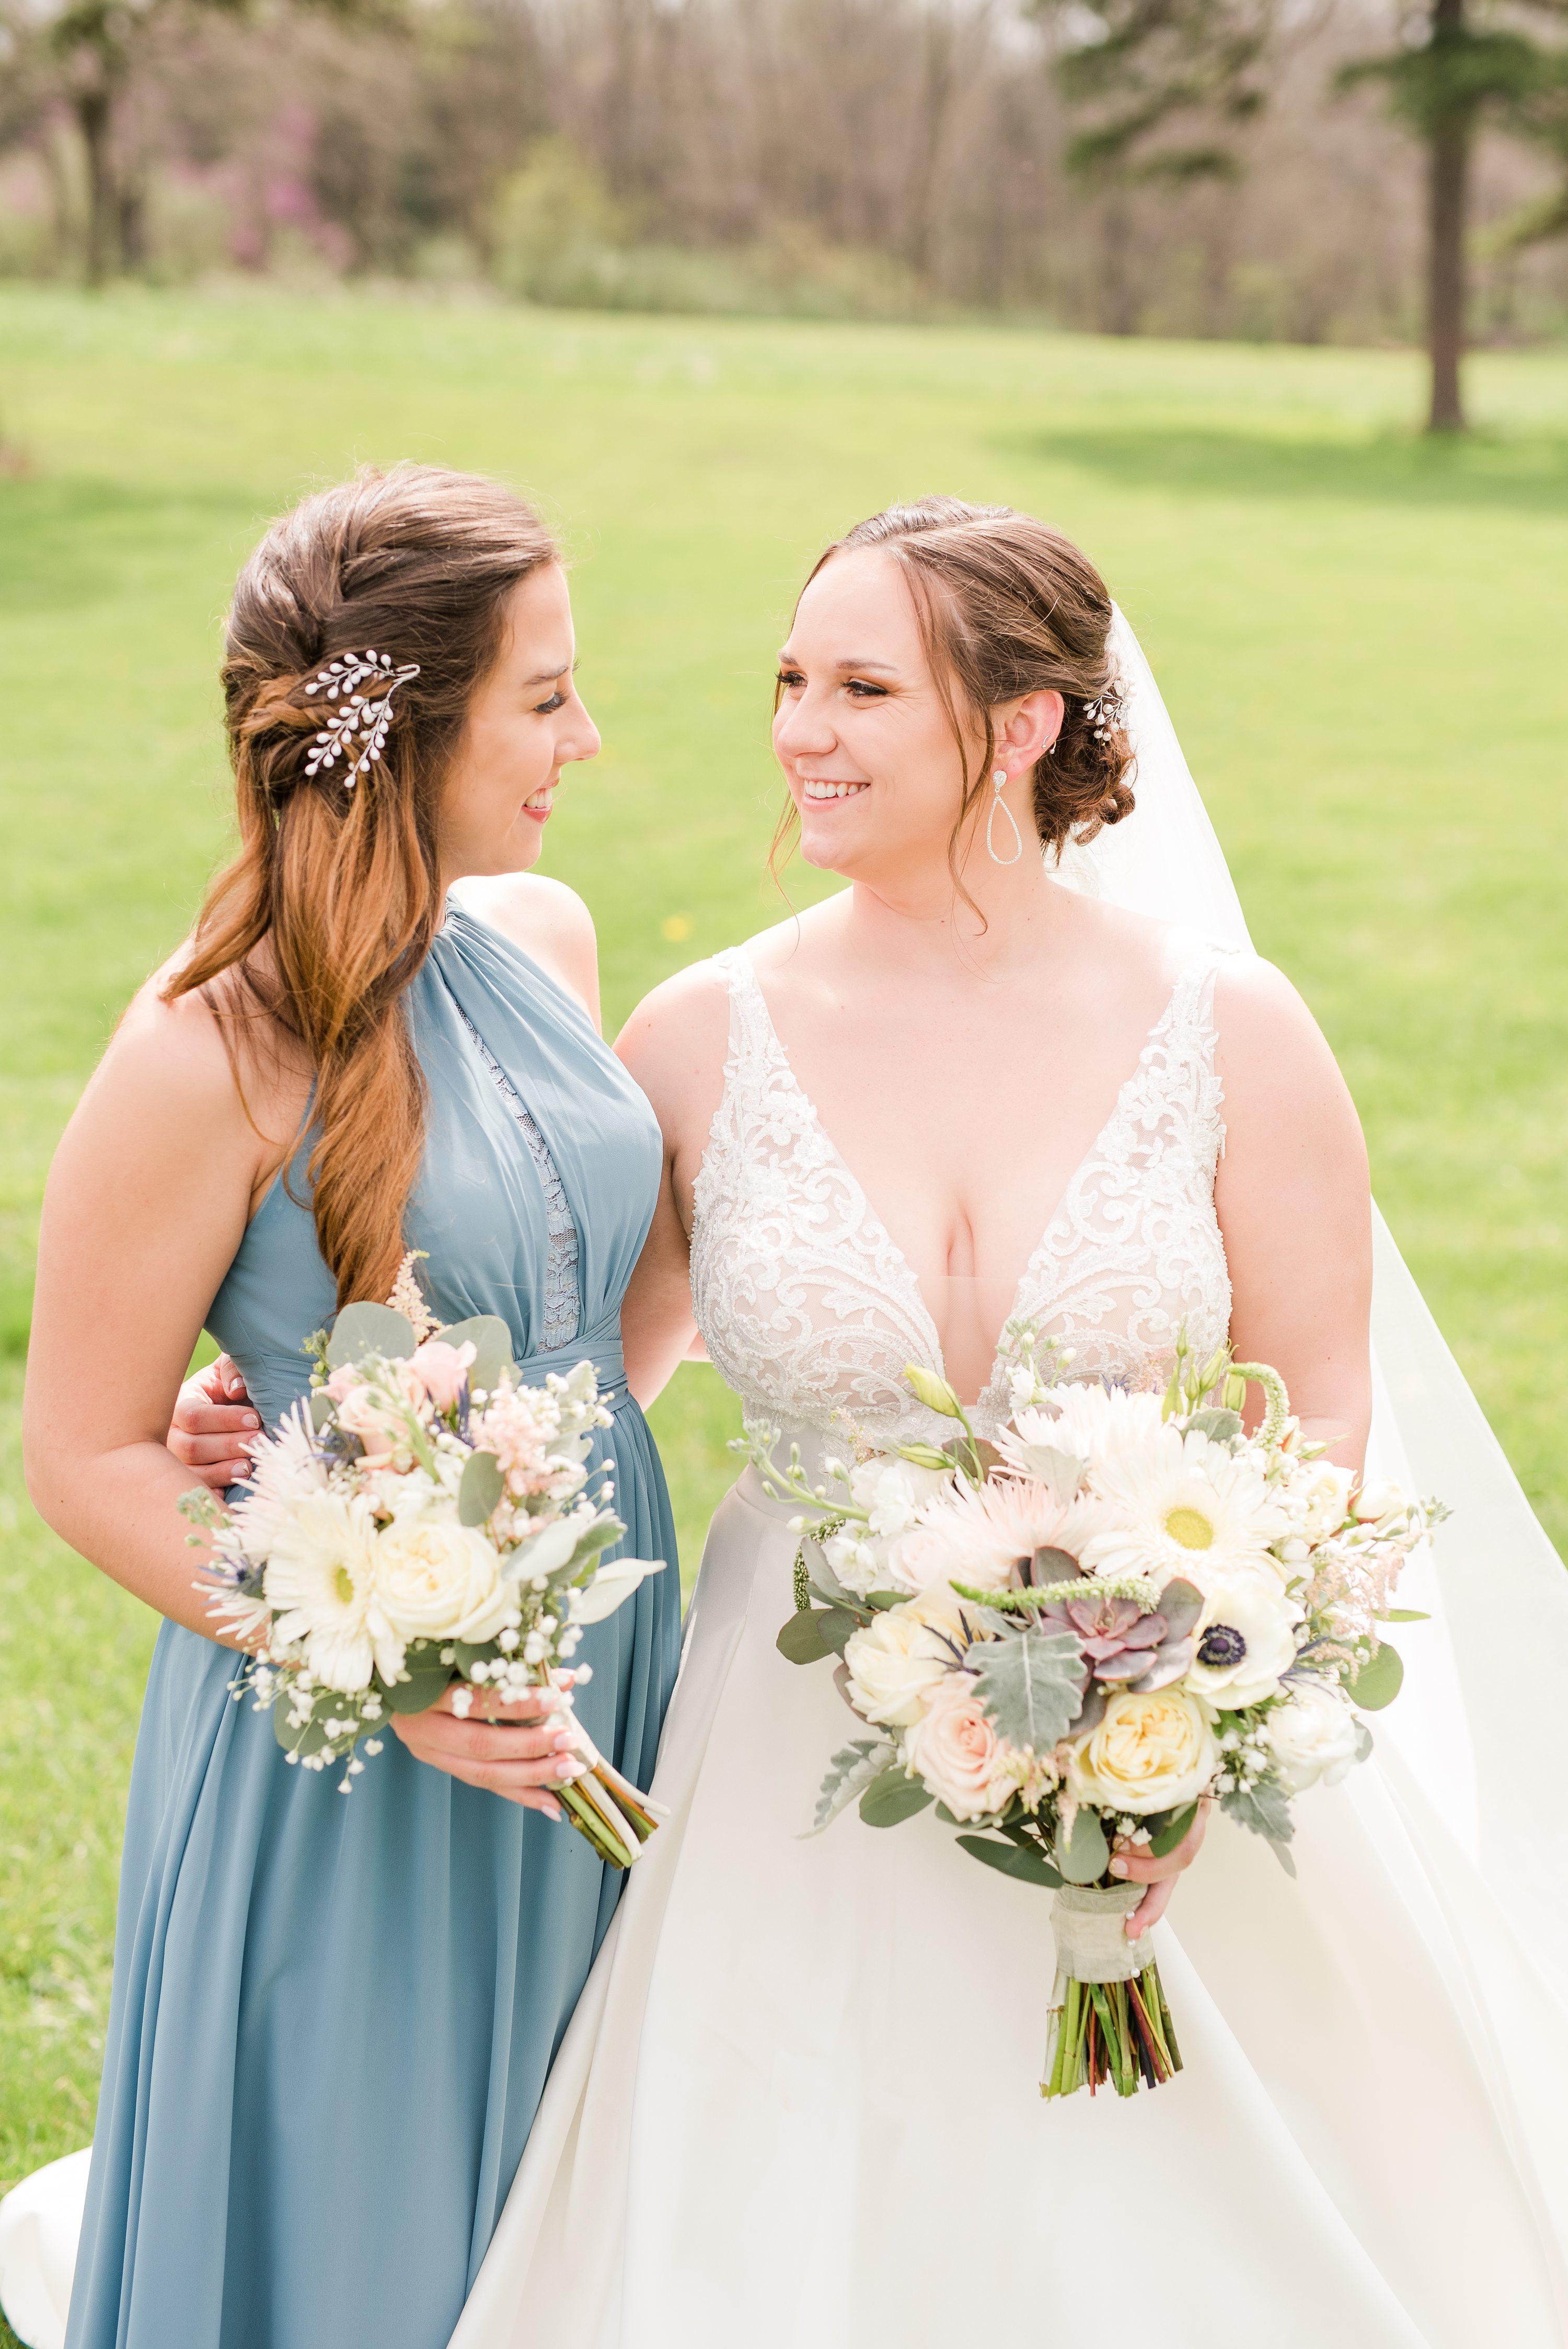 Spring Wedding,Virginia Wedding Photographer,Barn at Edgewood,bride and bridesmaids,bridesmaids,bride